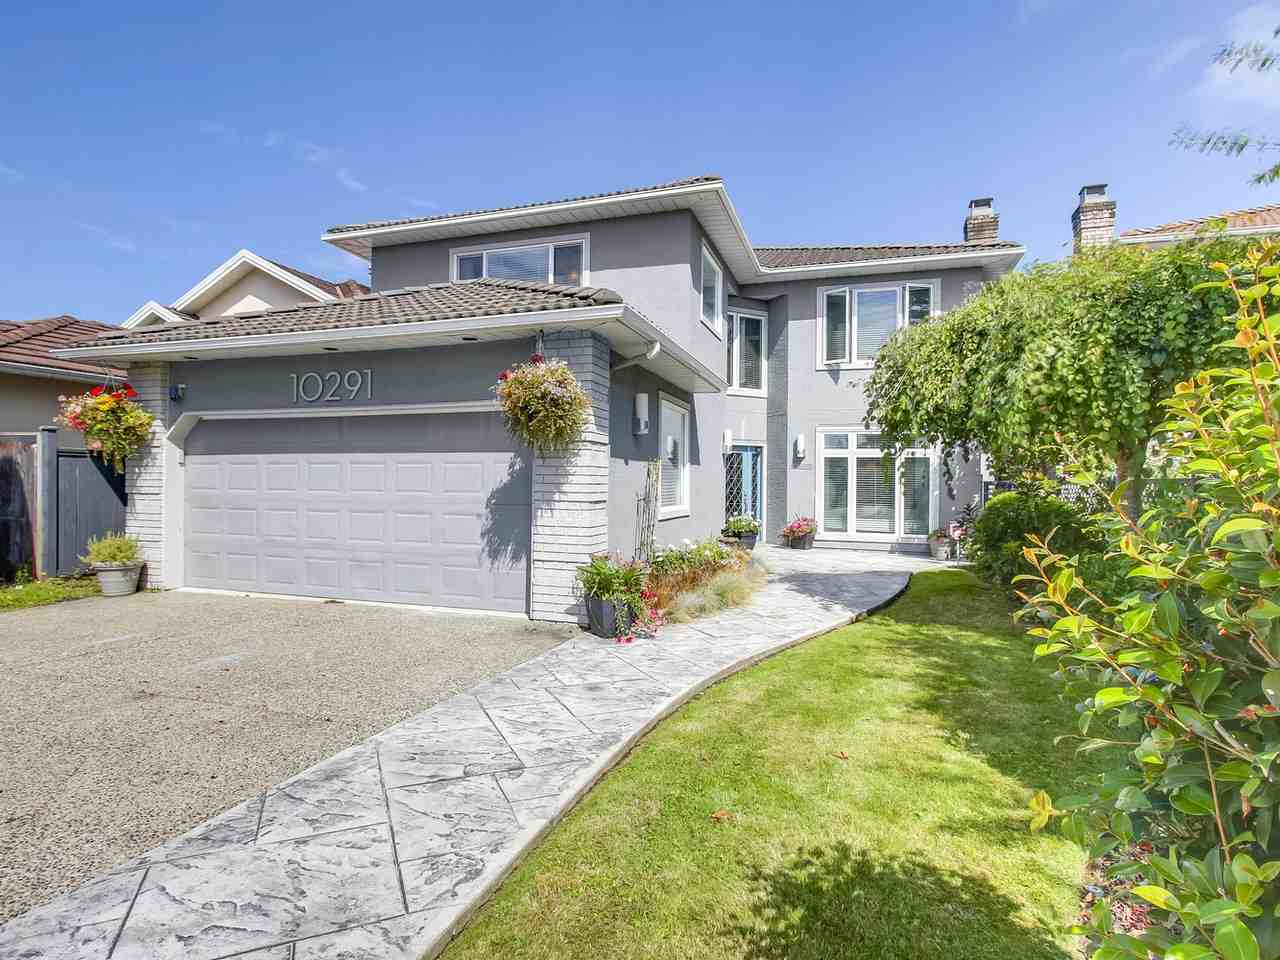 Sold: 10291 Bryson Drive, Richmond, BC